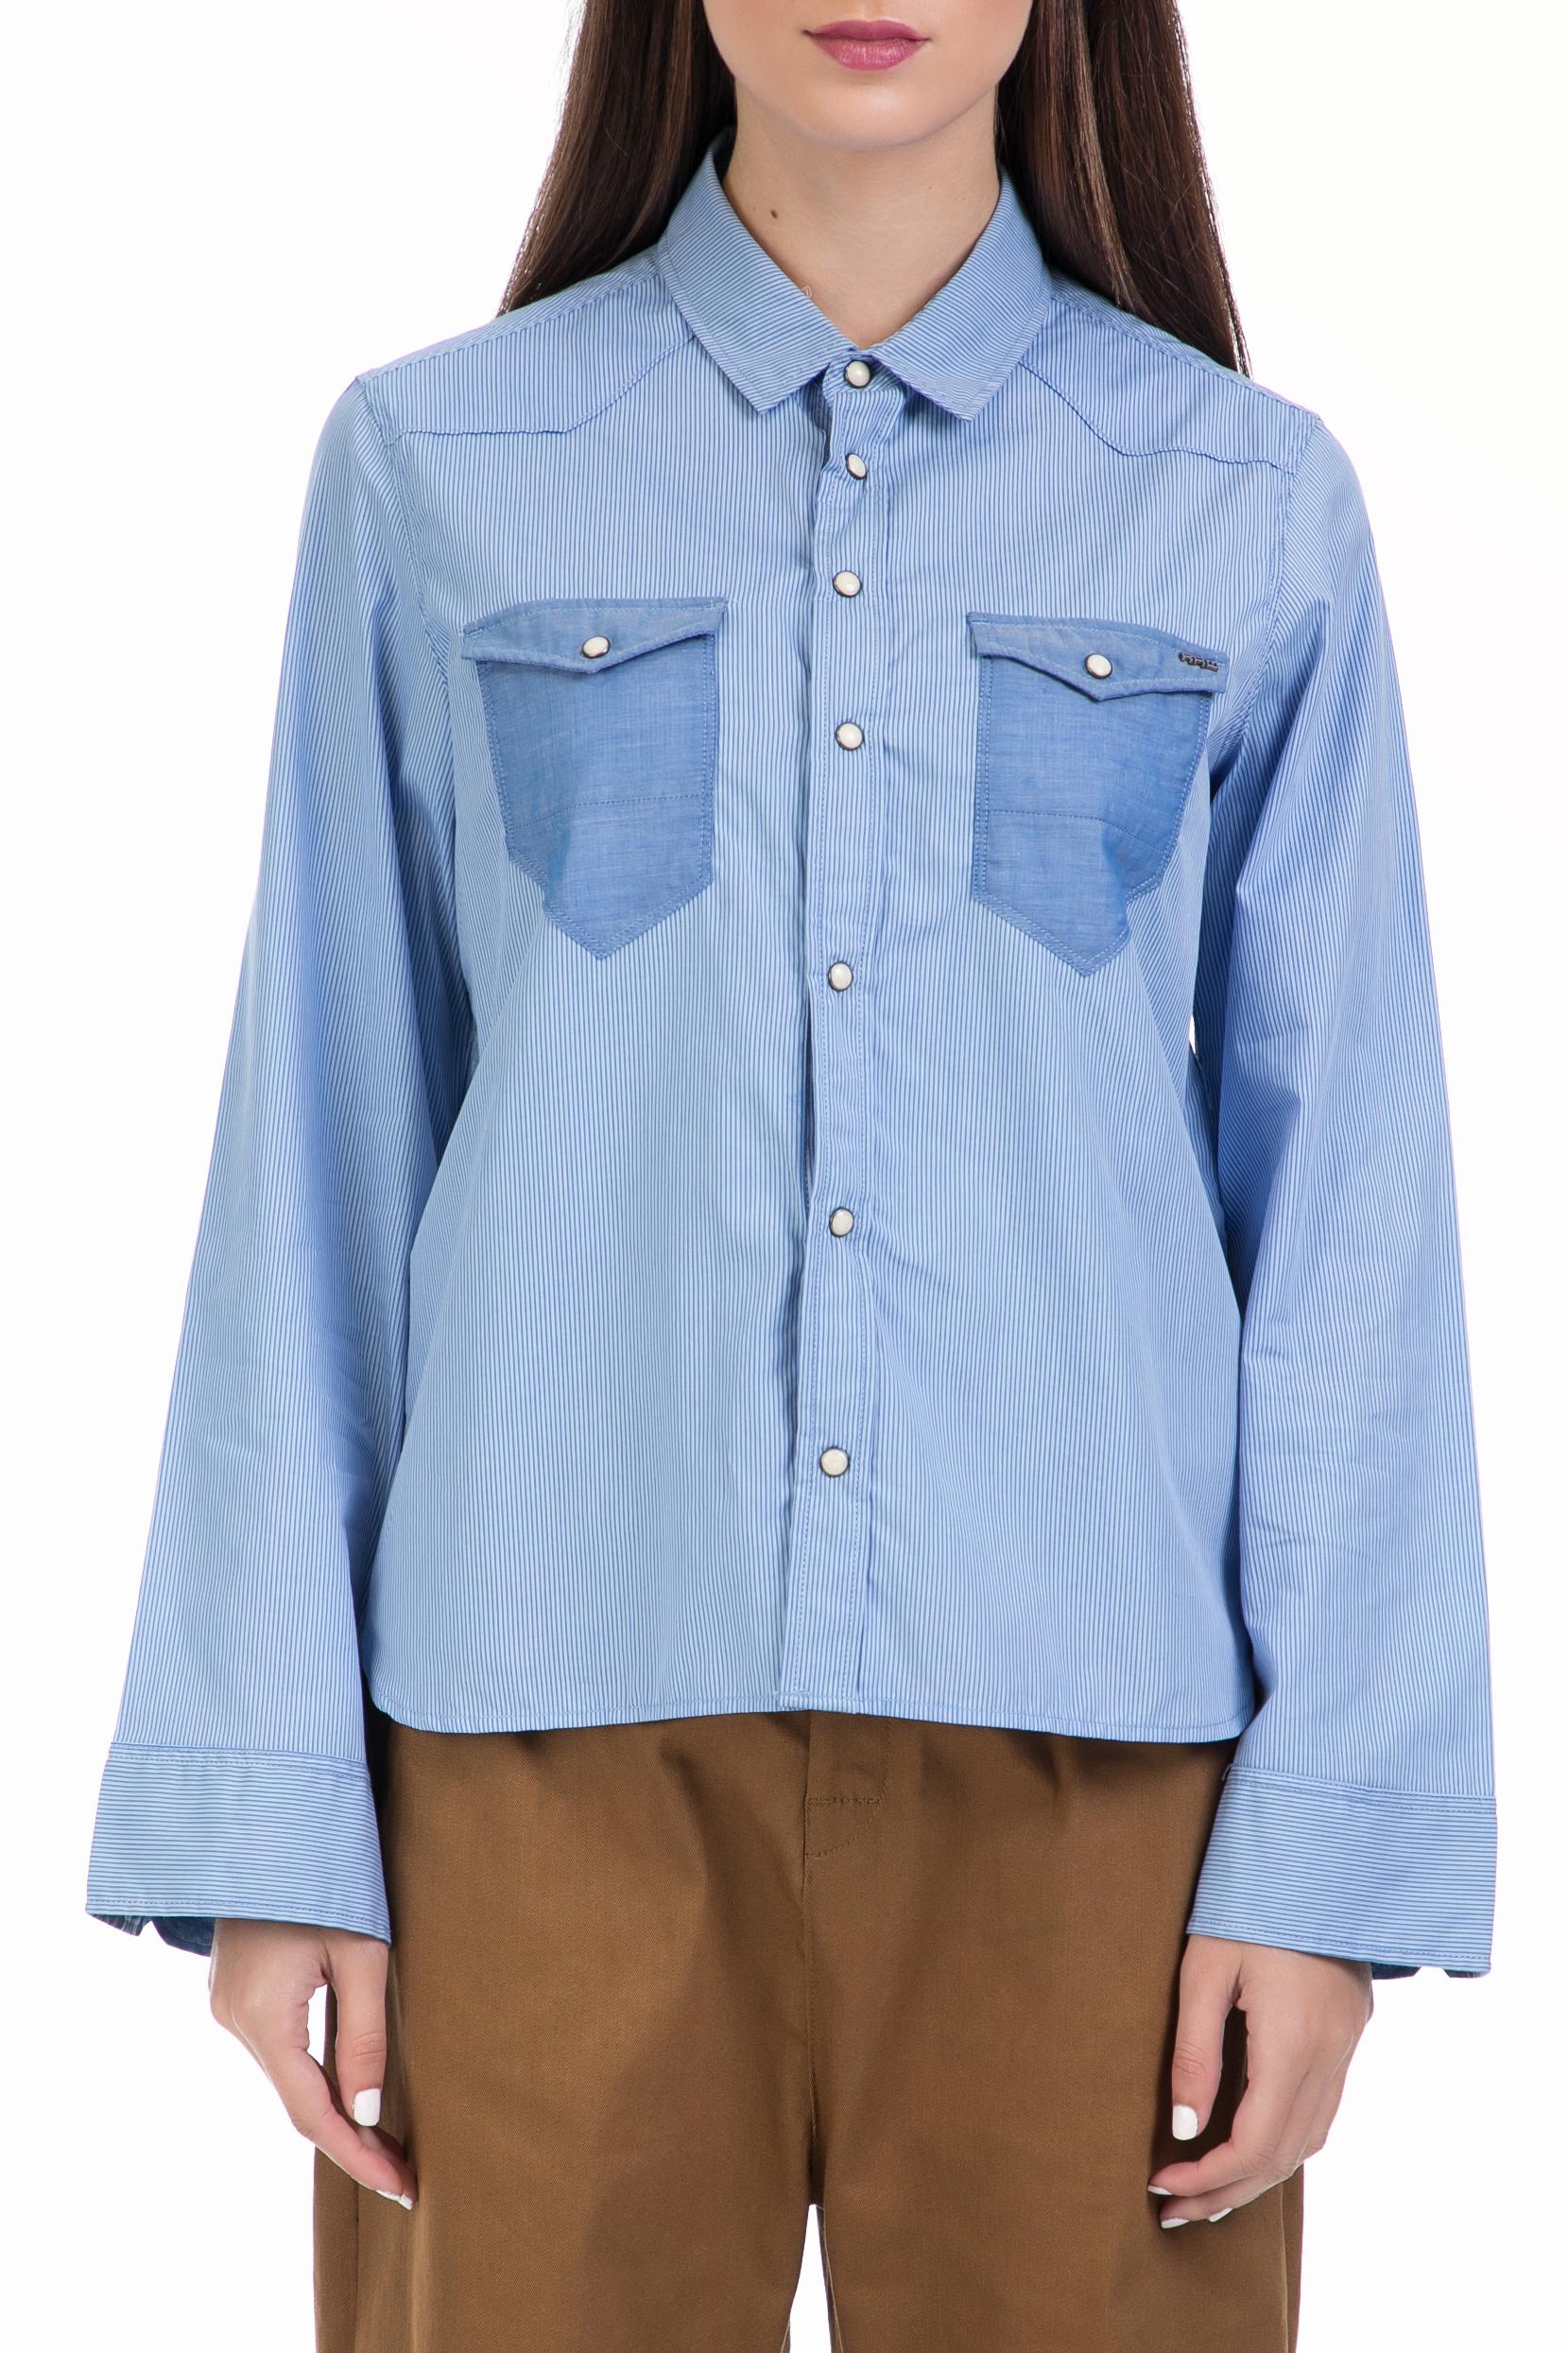 G-STAR RAW - Γυναικείο πουκάμισο Tacoma wide slv bf croppe μπλε γυναικεία ρούχα πουκάμισα μακρυμάνικα